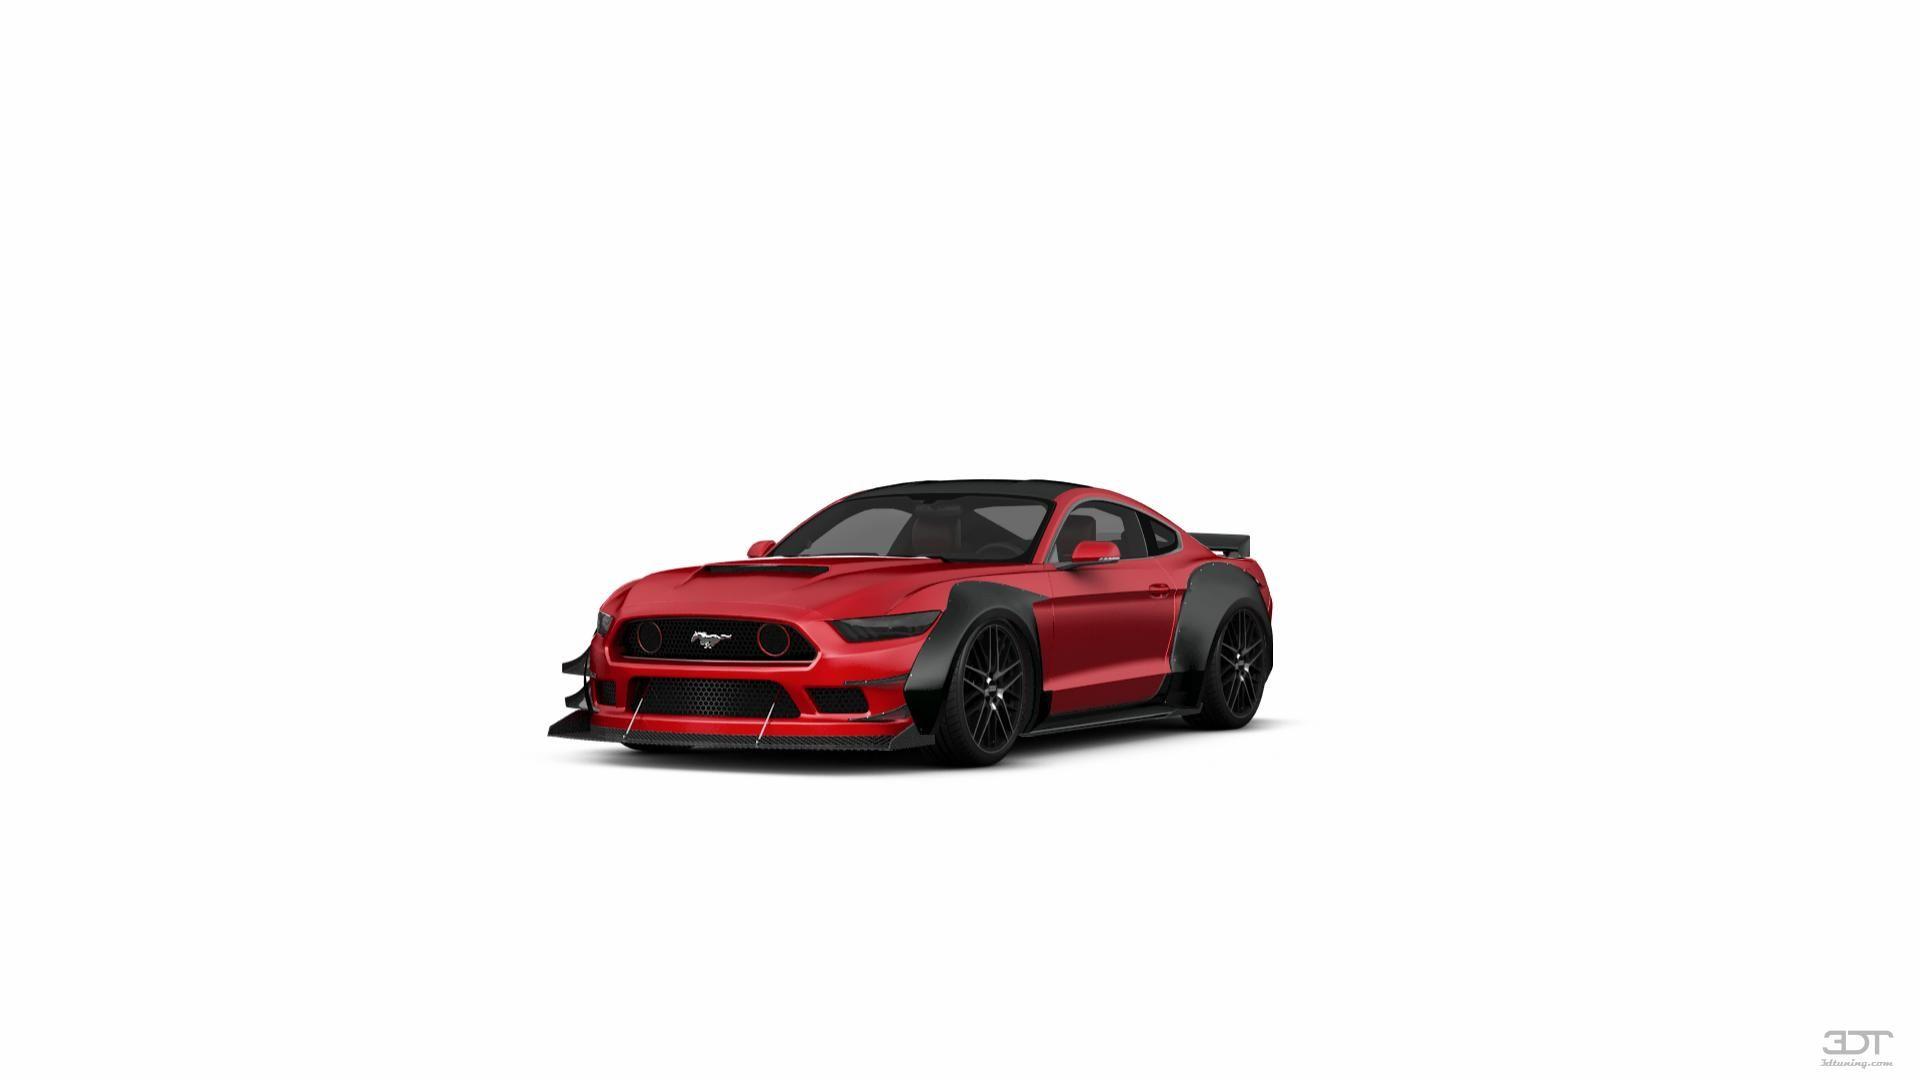 Checkout my tuning Mustang GT 2115 at 3DTuning 3dtuning tuning